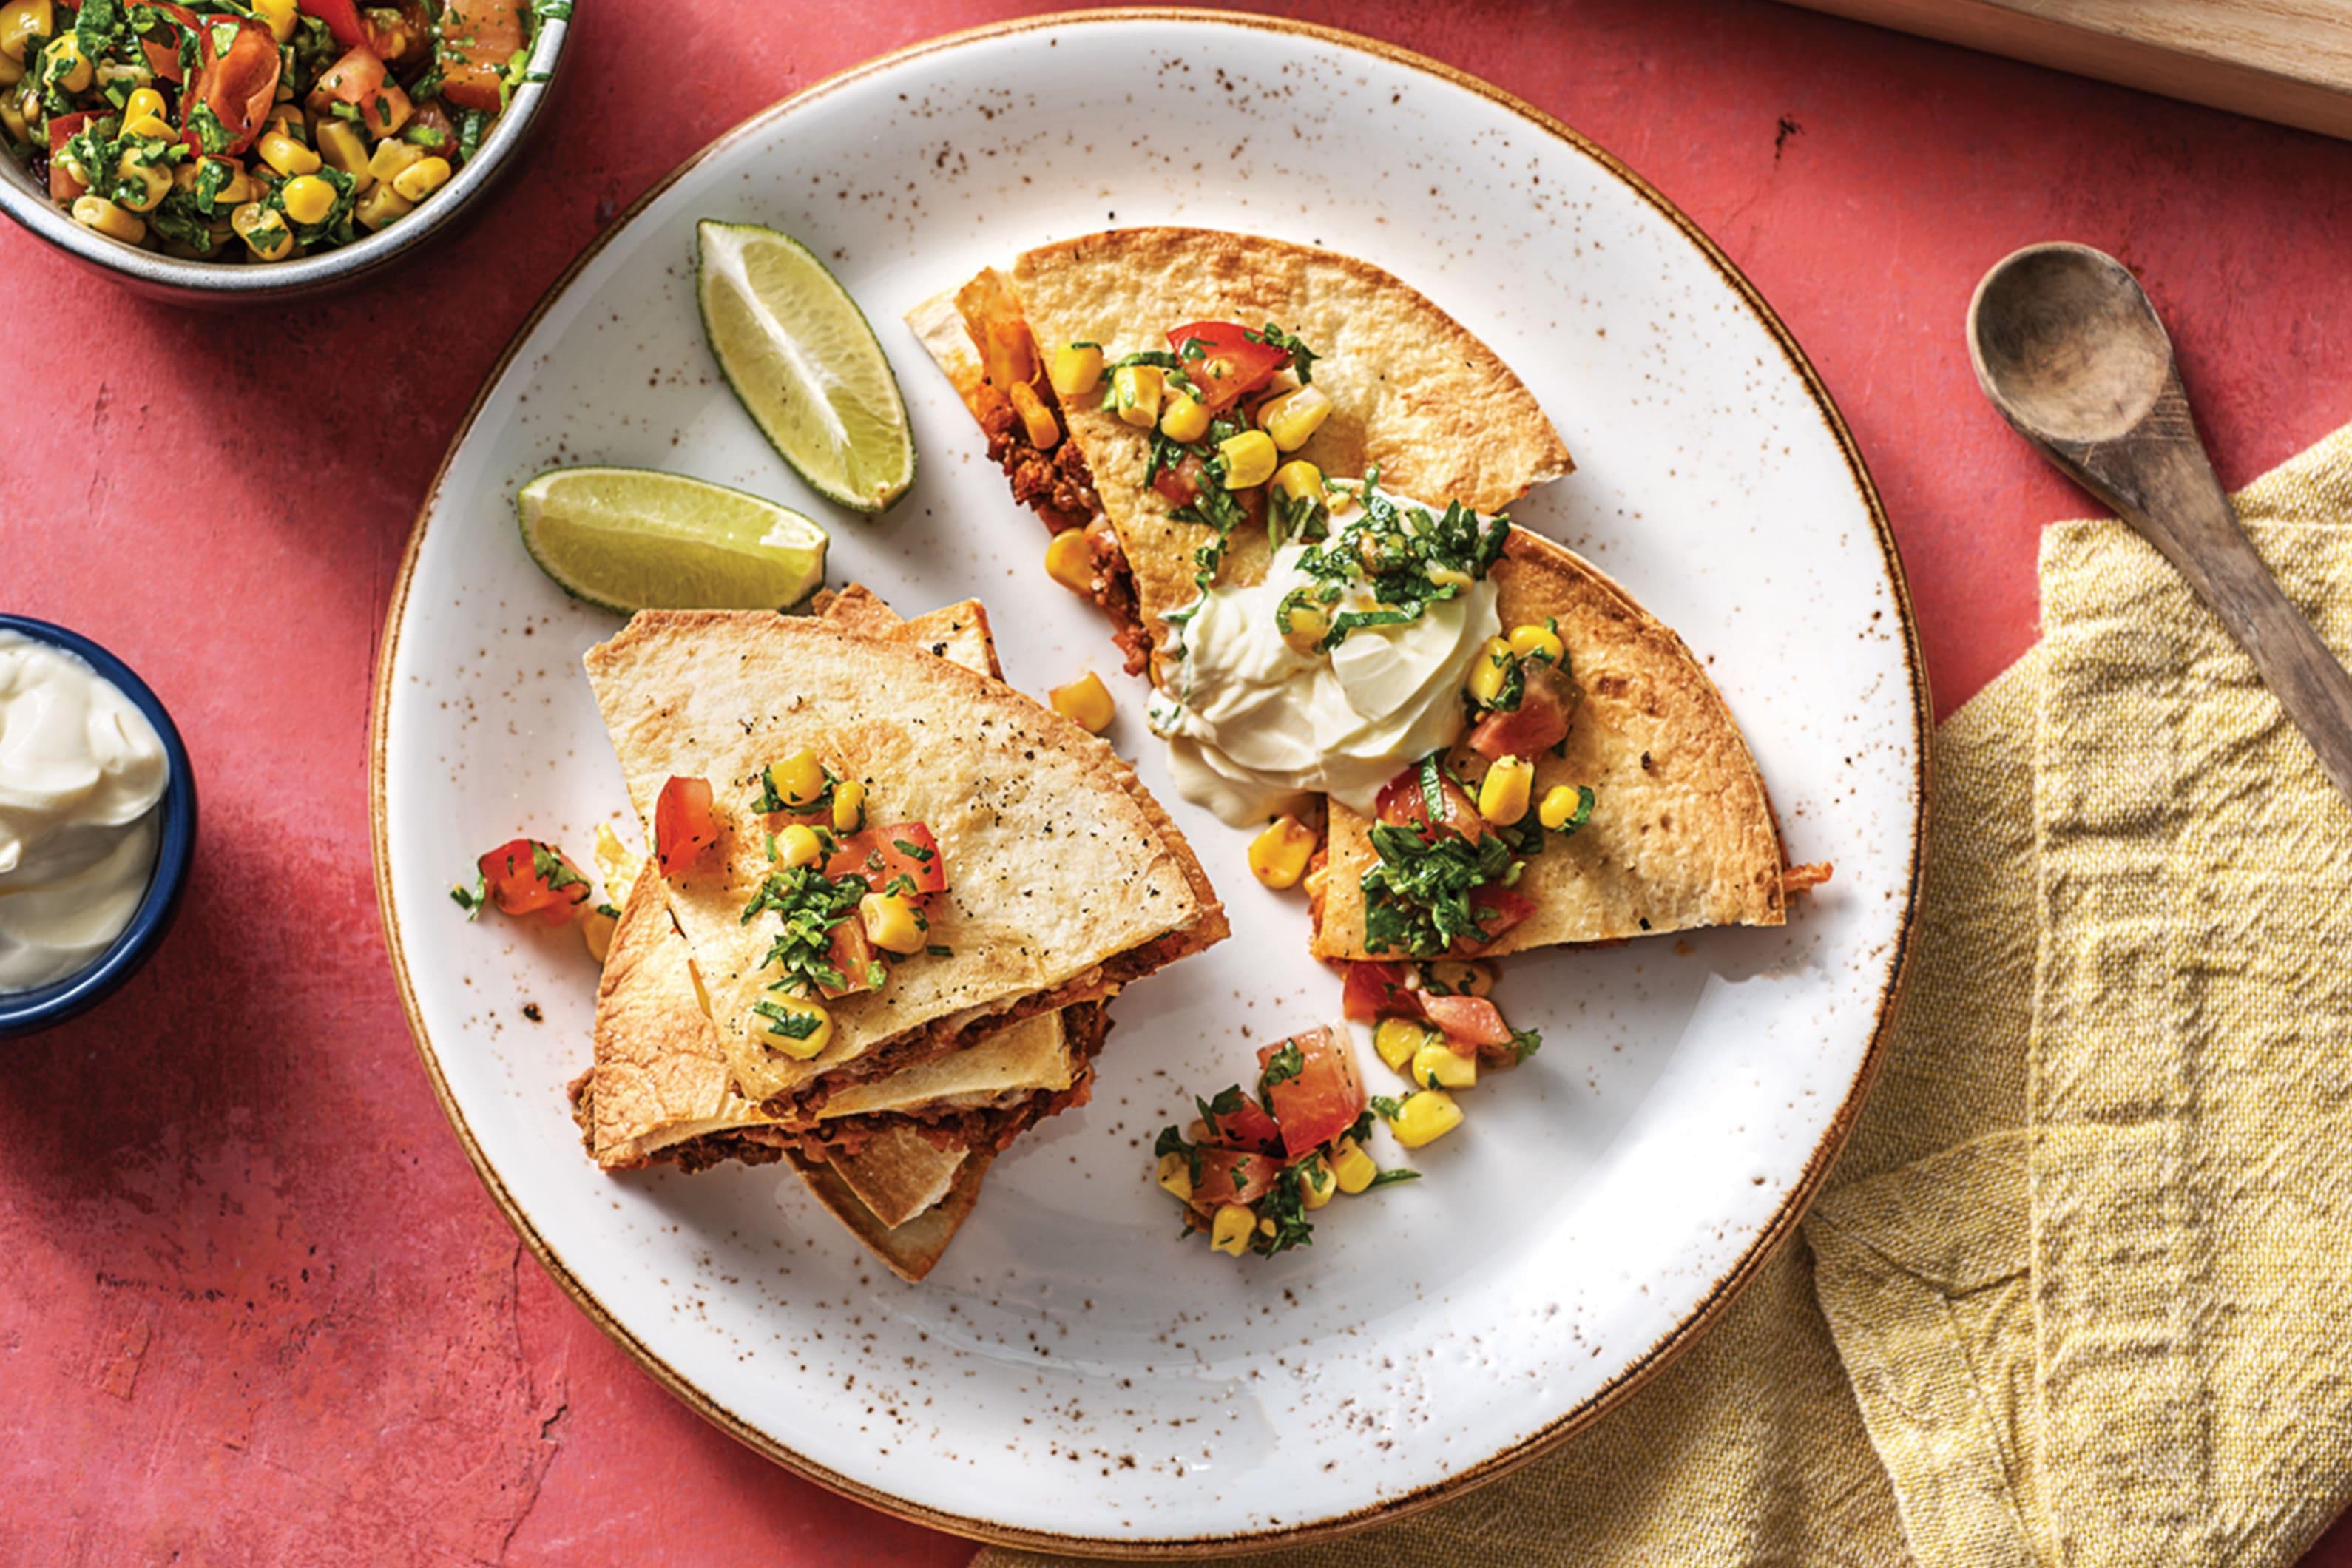 Oven-Baked Beef & Corn Quesadillas